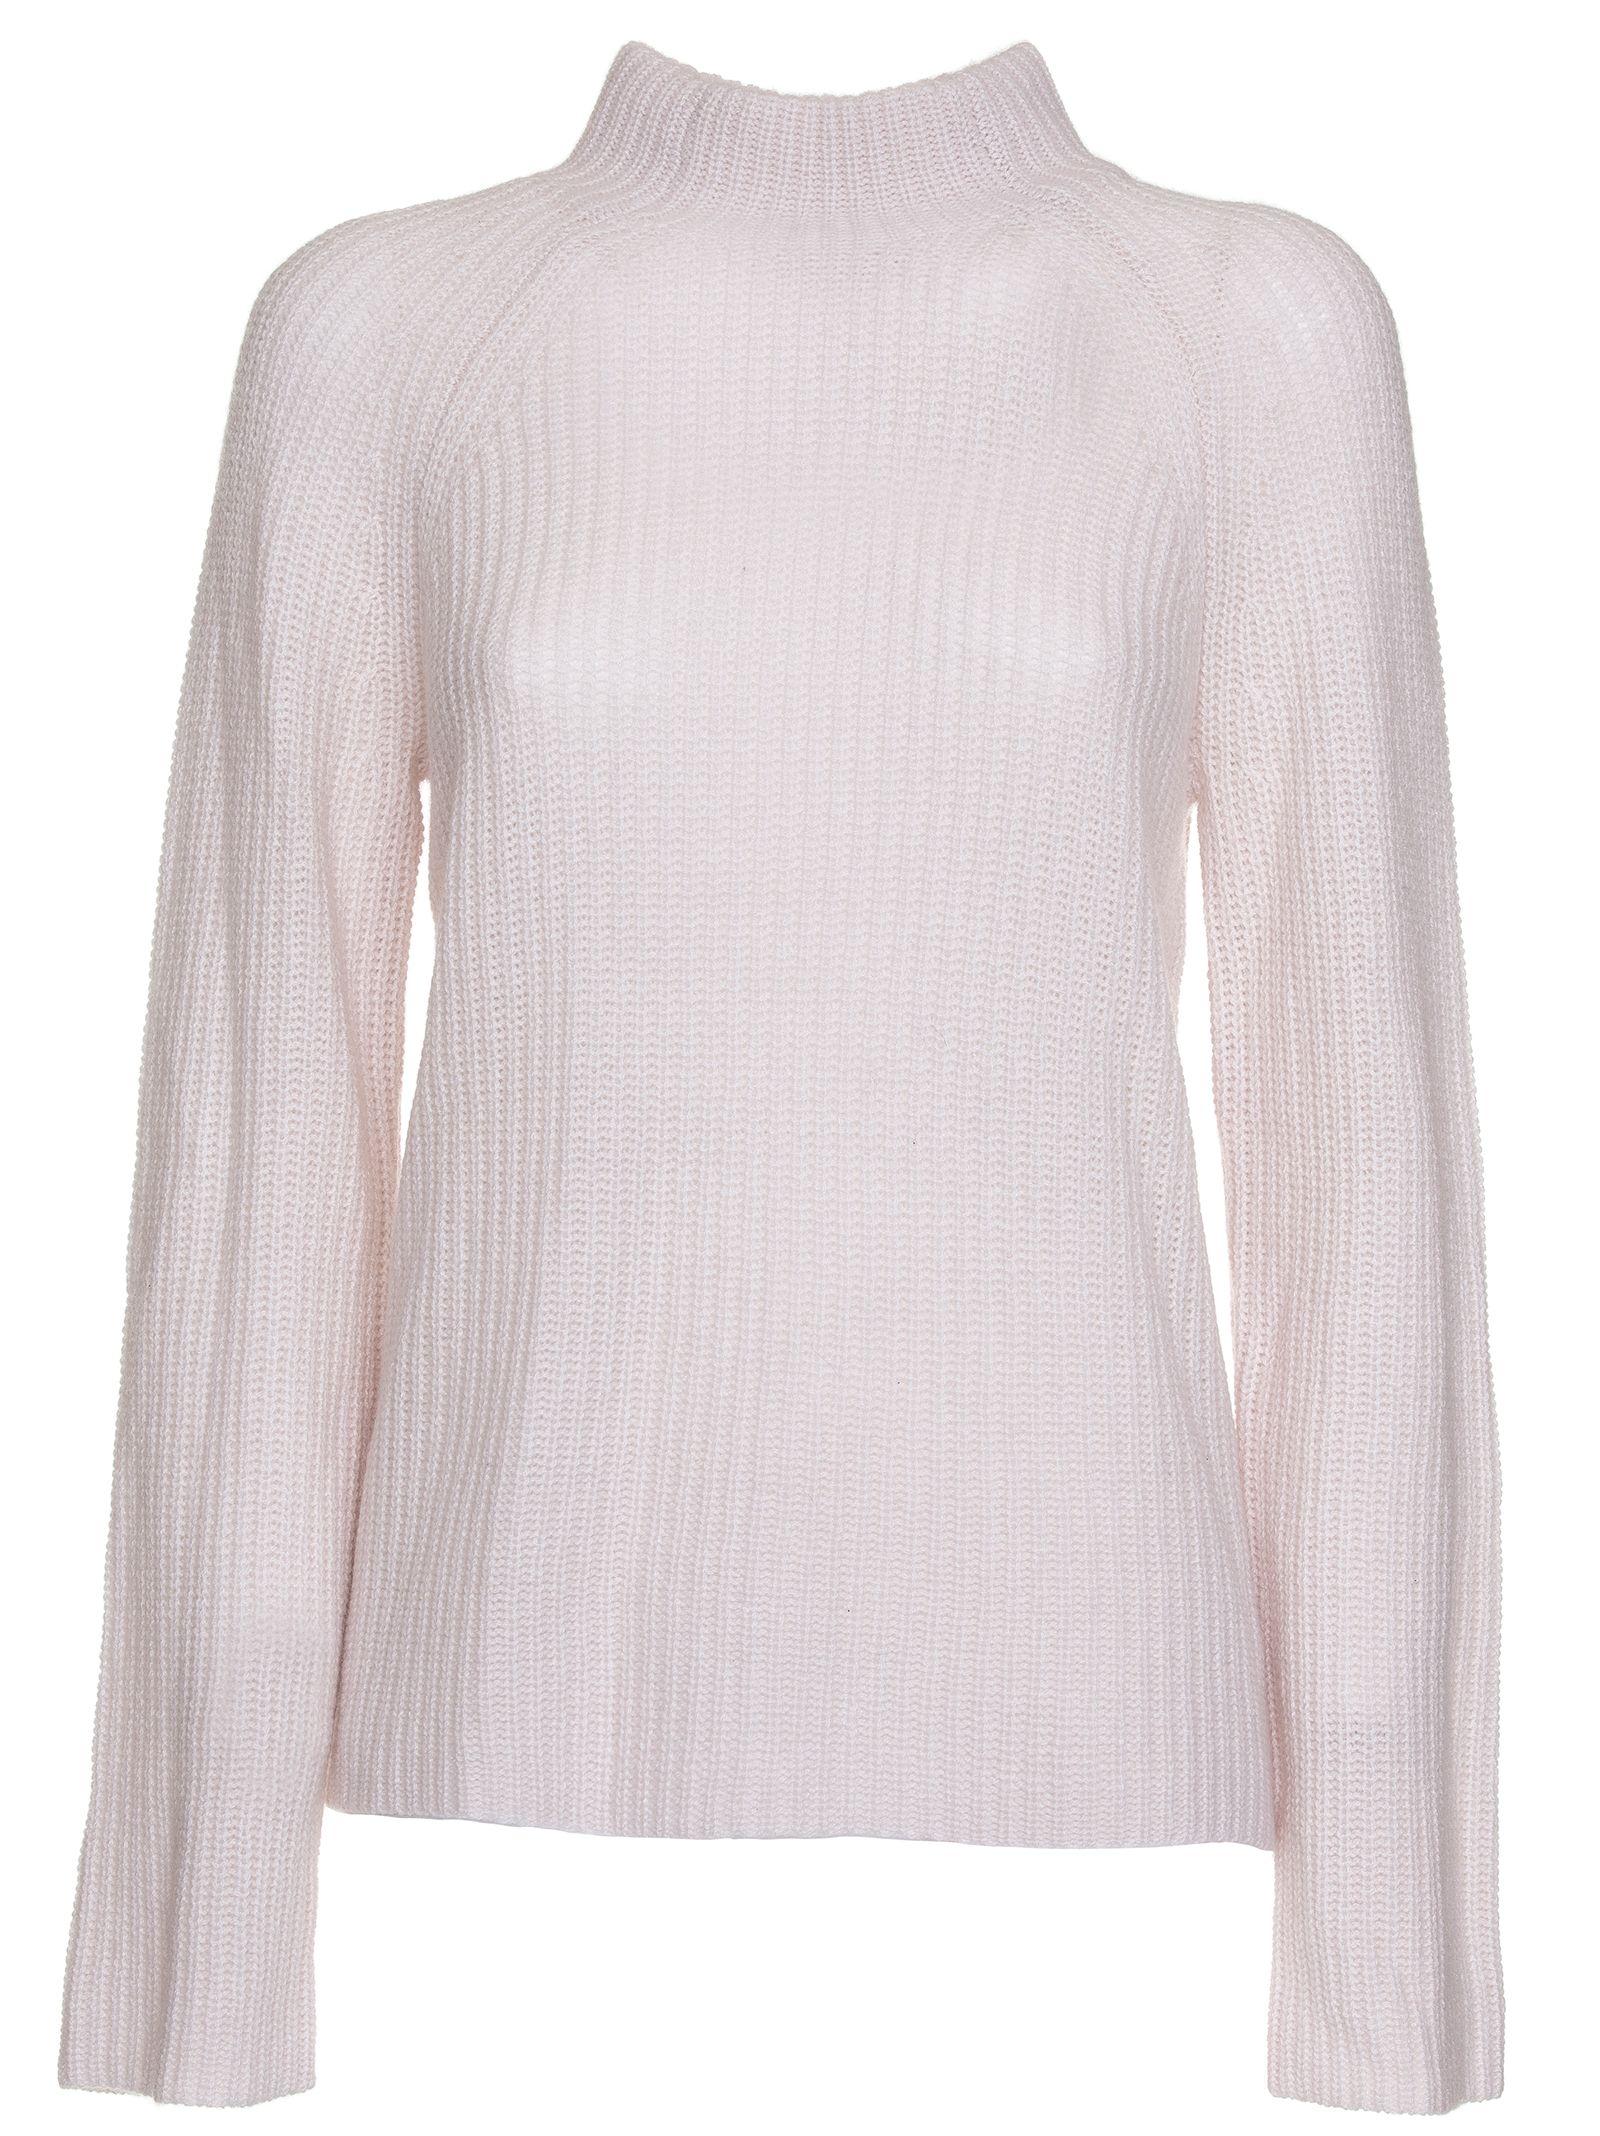 360cashmere Maye Sweater In White